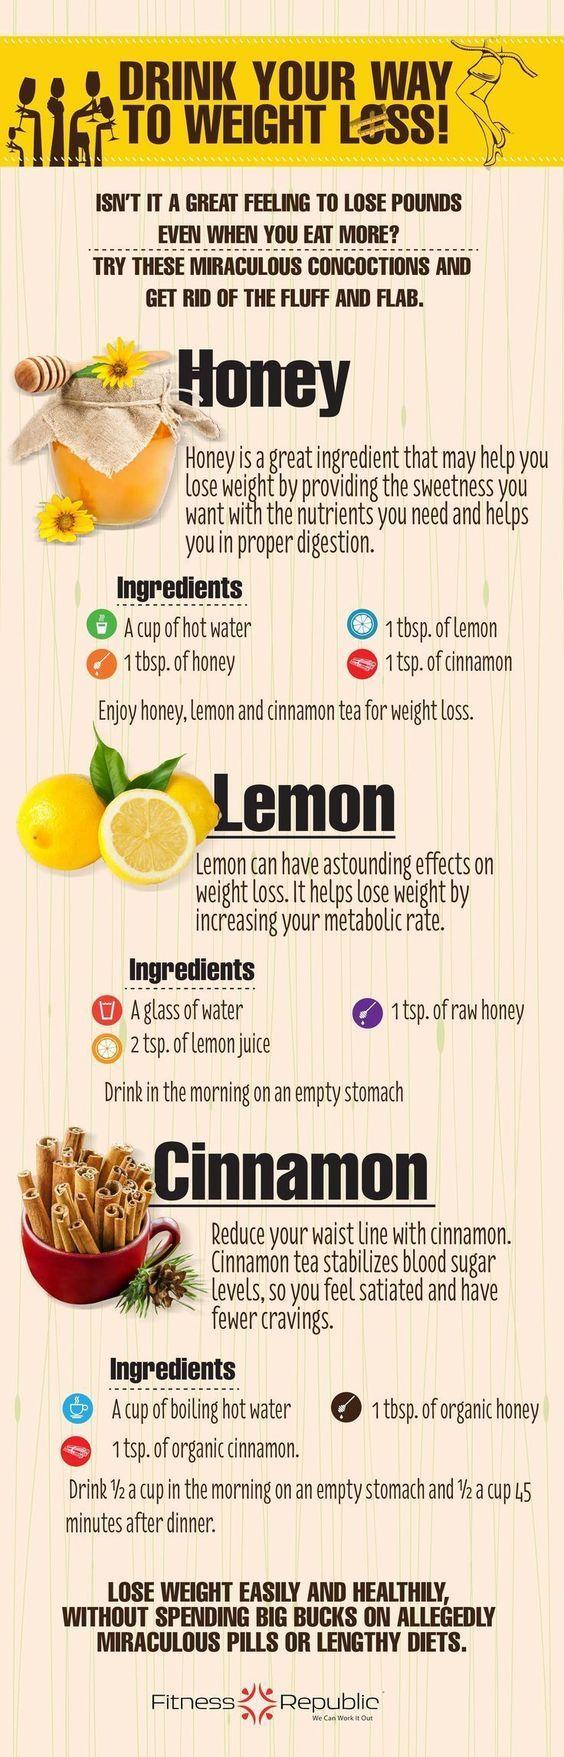 Honey lemon and cinnamon looks like i might have to start liking lemon haha